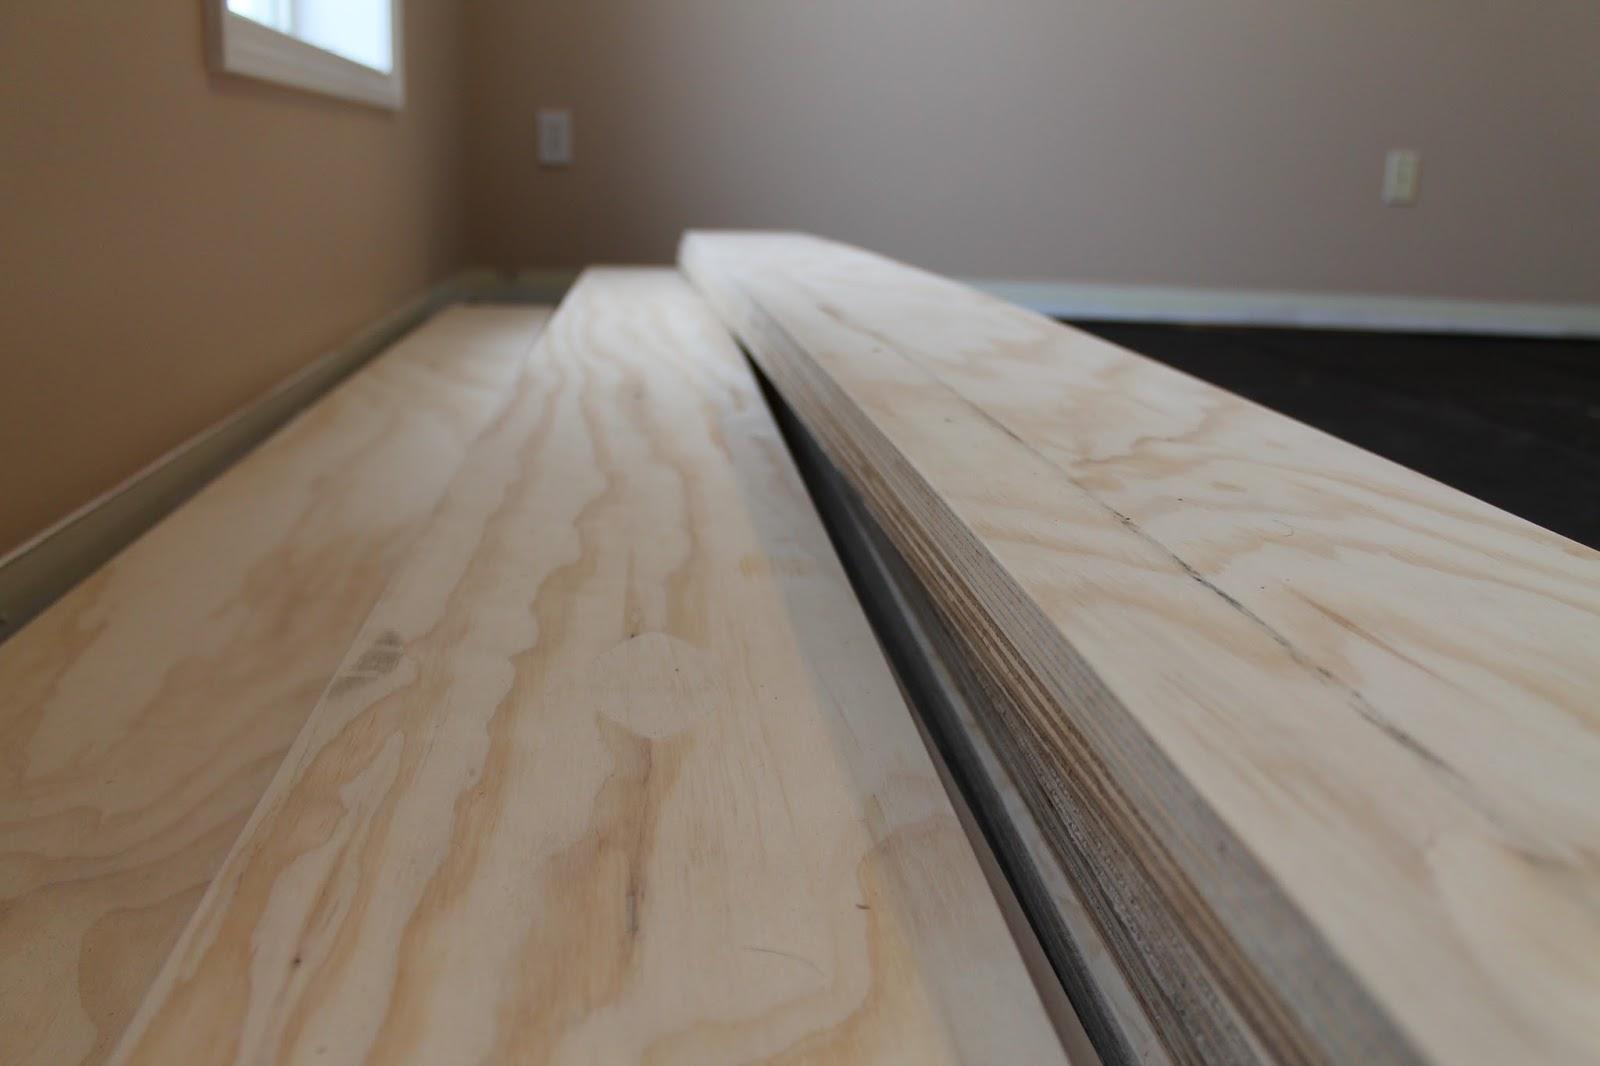 Diy plywood flooring an inexpensive hardwood alternative for Inexpensive flooring alternatives